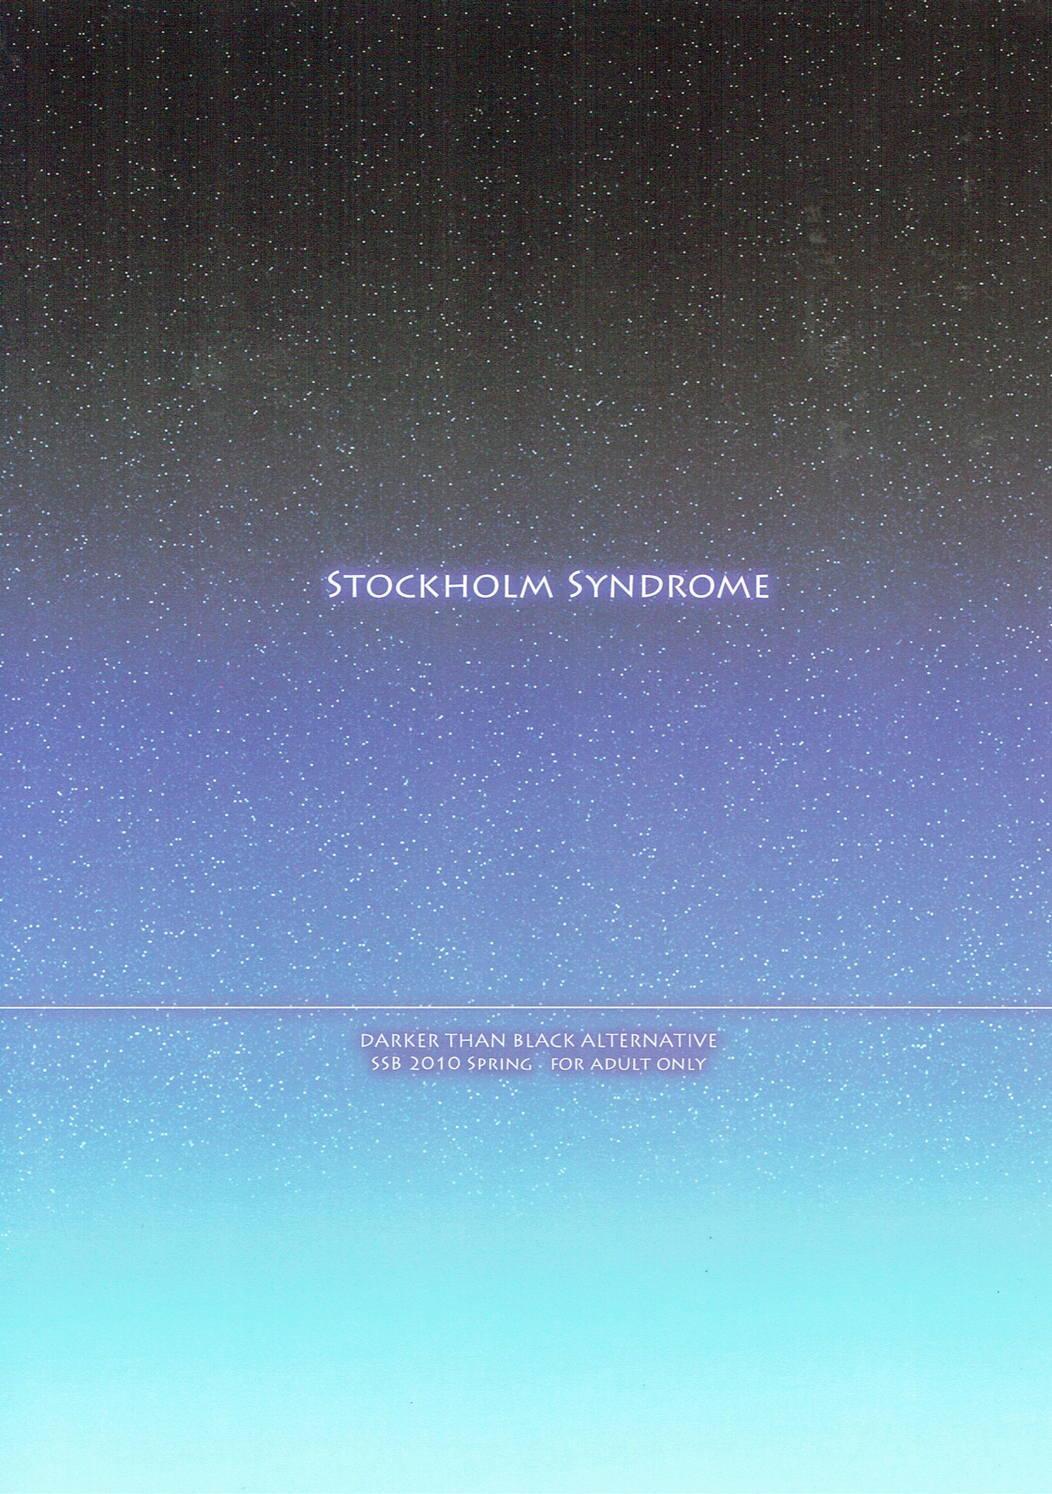 STOCKHOLM SYNDROME 25